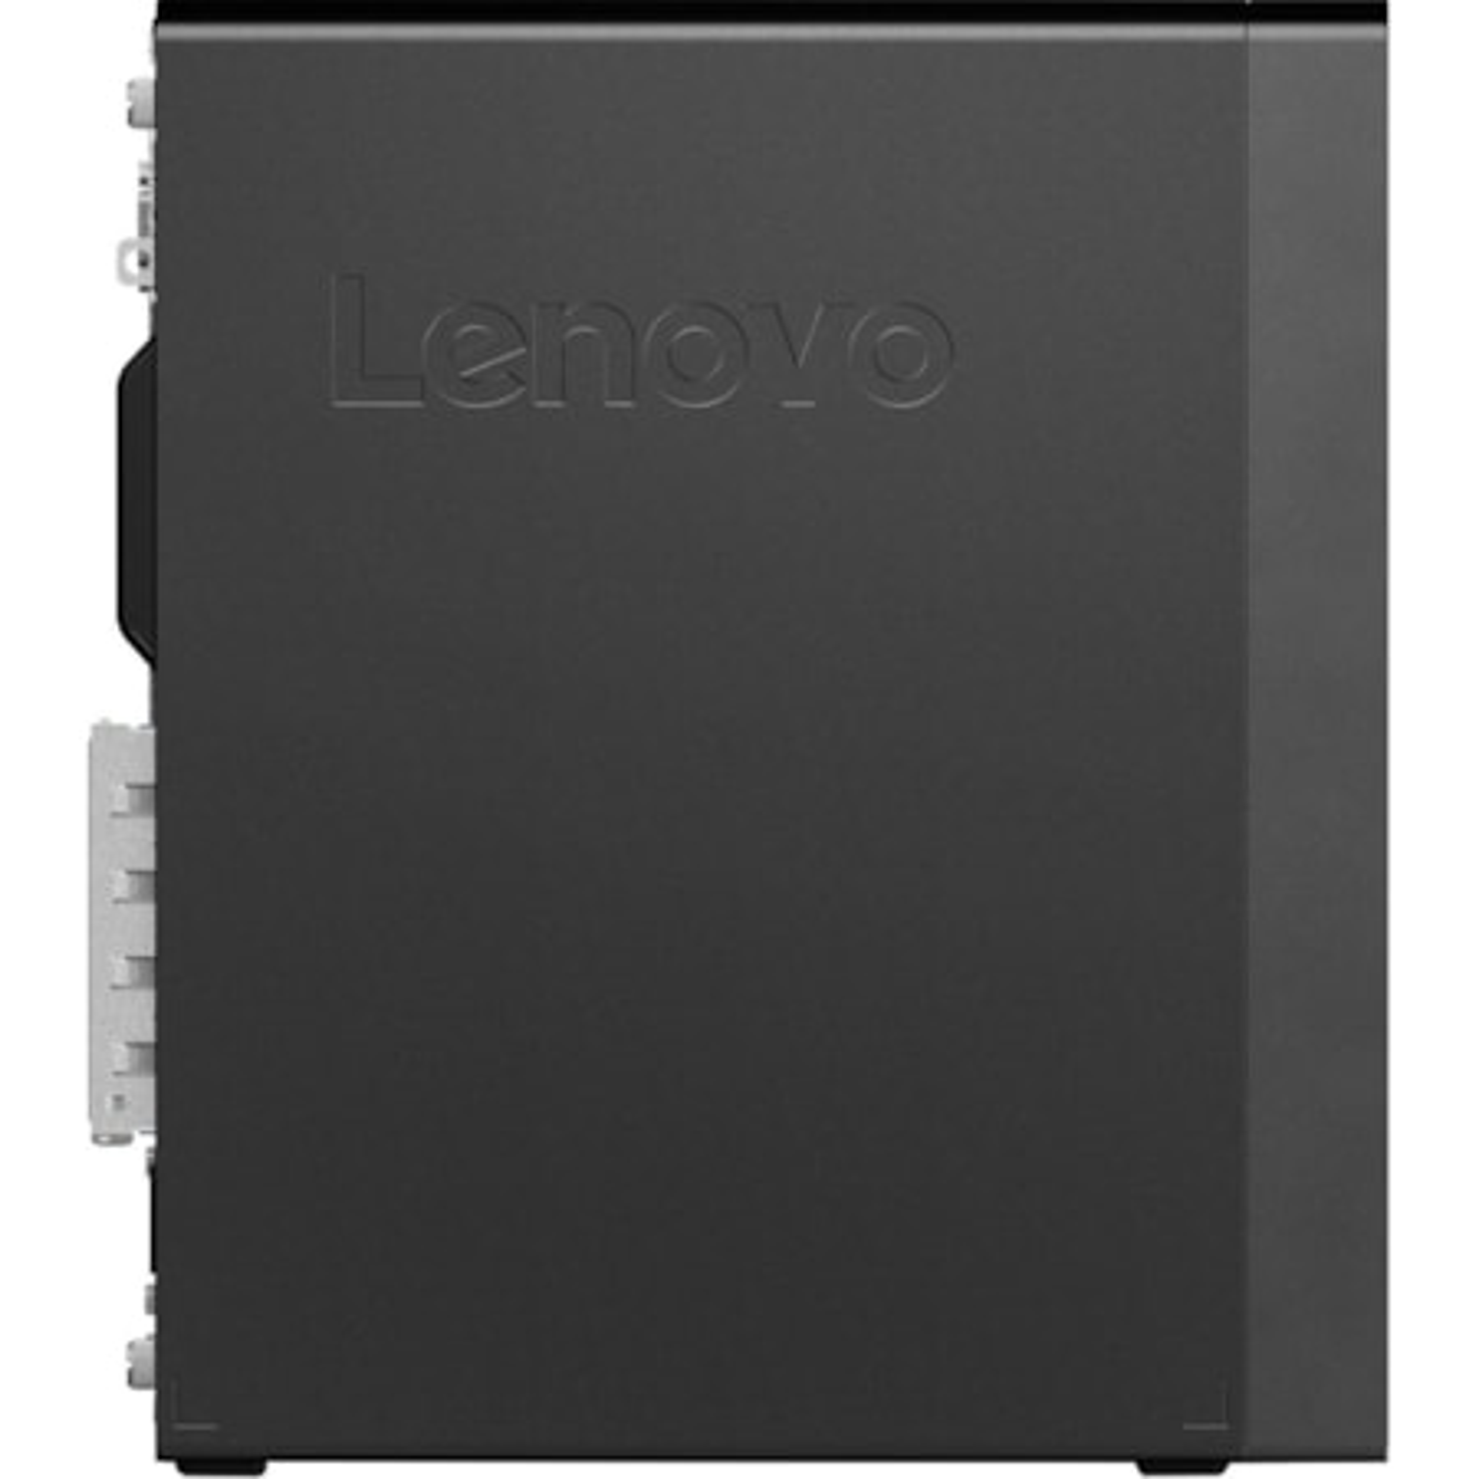 Lenovo ThinkStation P330 30C8S0UU00 Workstation - 1 x Intel Xeon E-2124G 3.40 GHz - 16 GB DDR4 SDRAM - 256 GB SSD - NVIDIA Quadro P400 2 GB Graphics - Windows 10 Pro for Workstations 64-bit - Small Form Factor